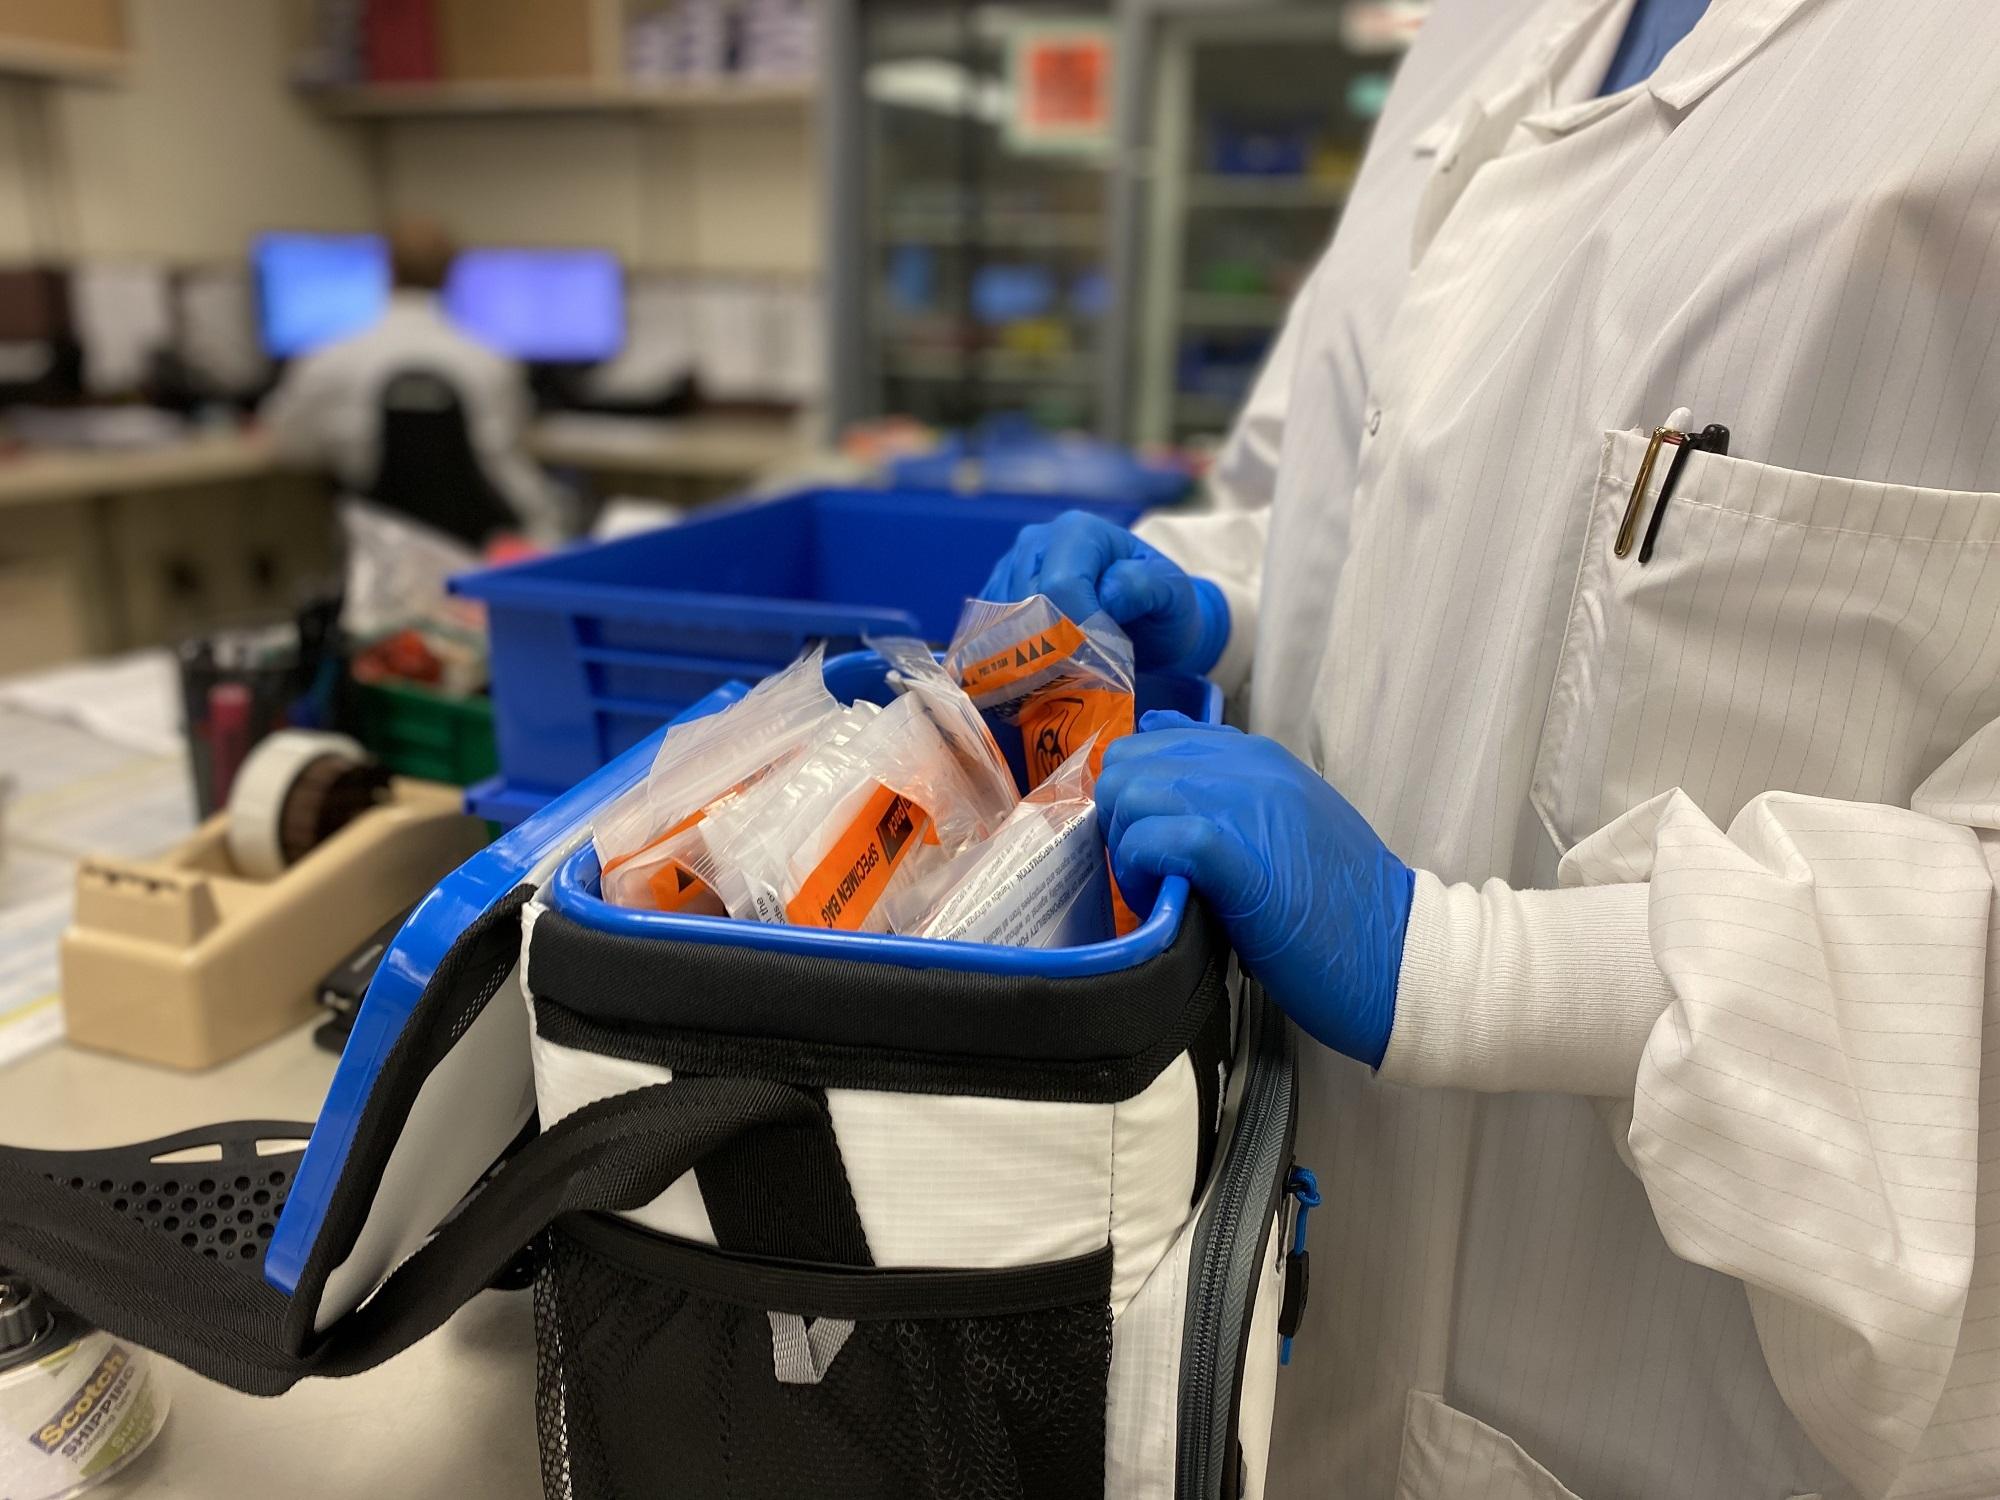 To illustrate story on antibody testing at National Jewish Health